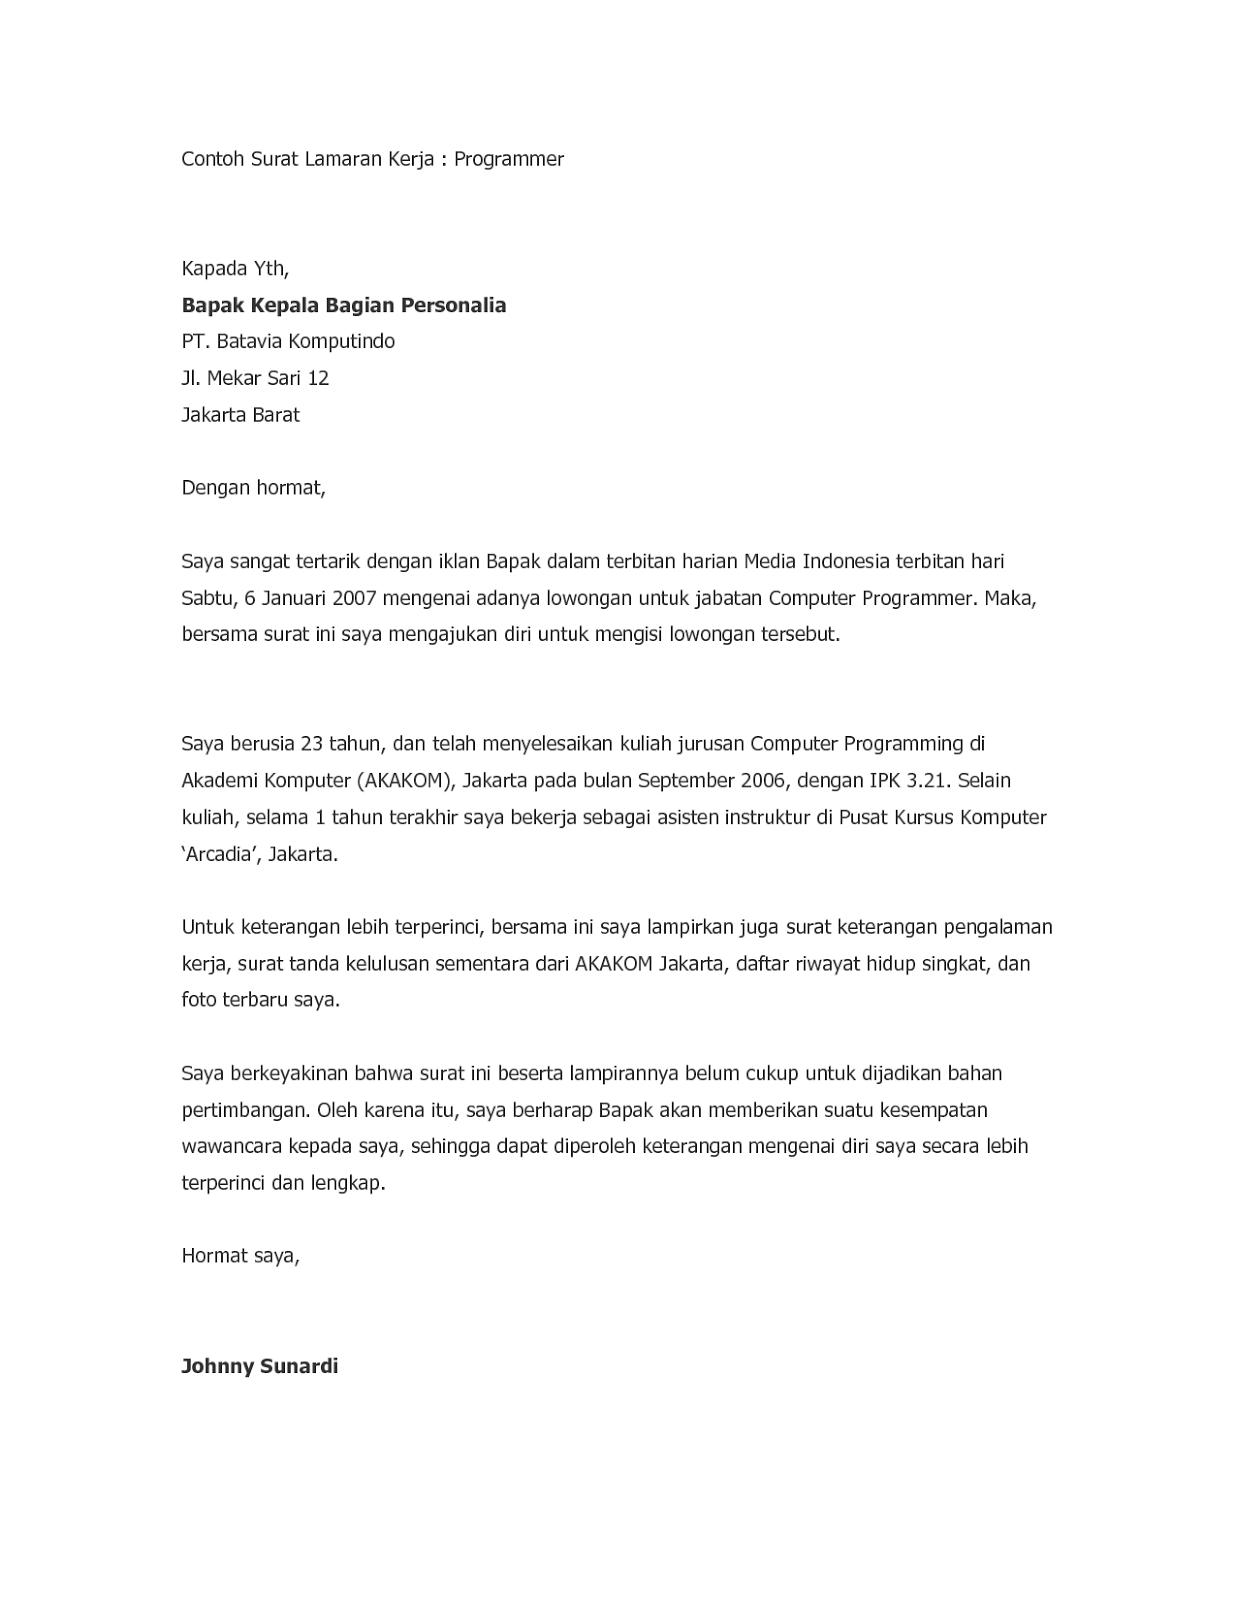 10 Contoh Surat Lamaran Kerja Indonesia - ben jobs